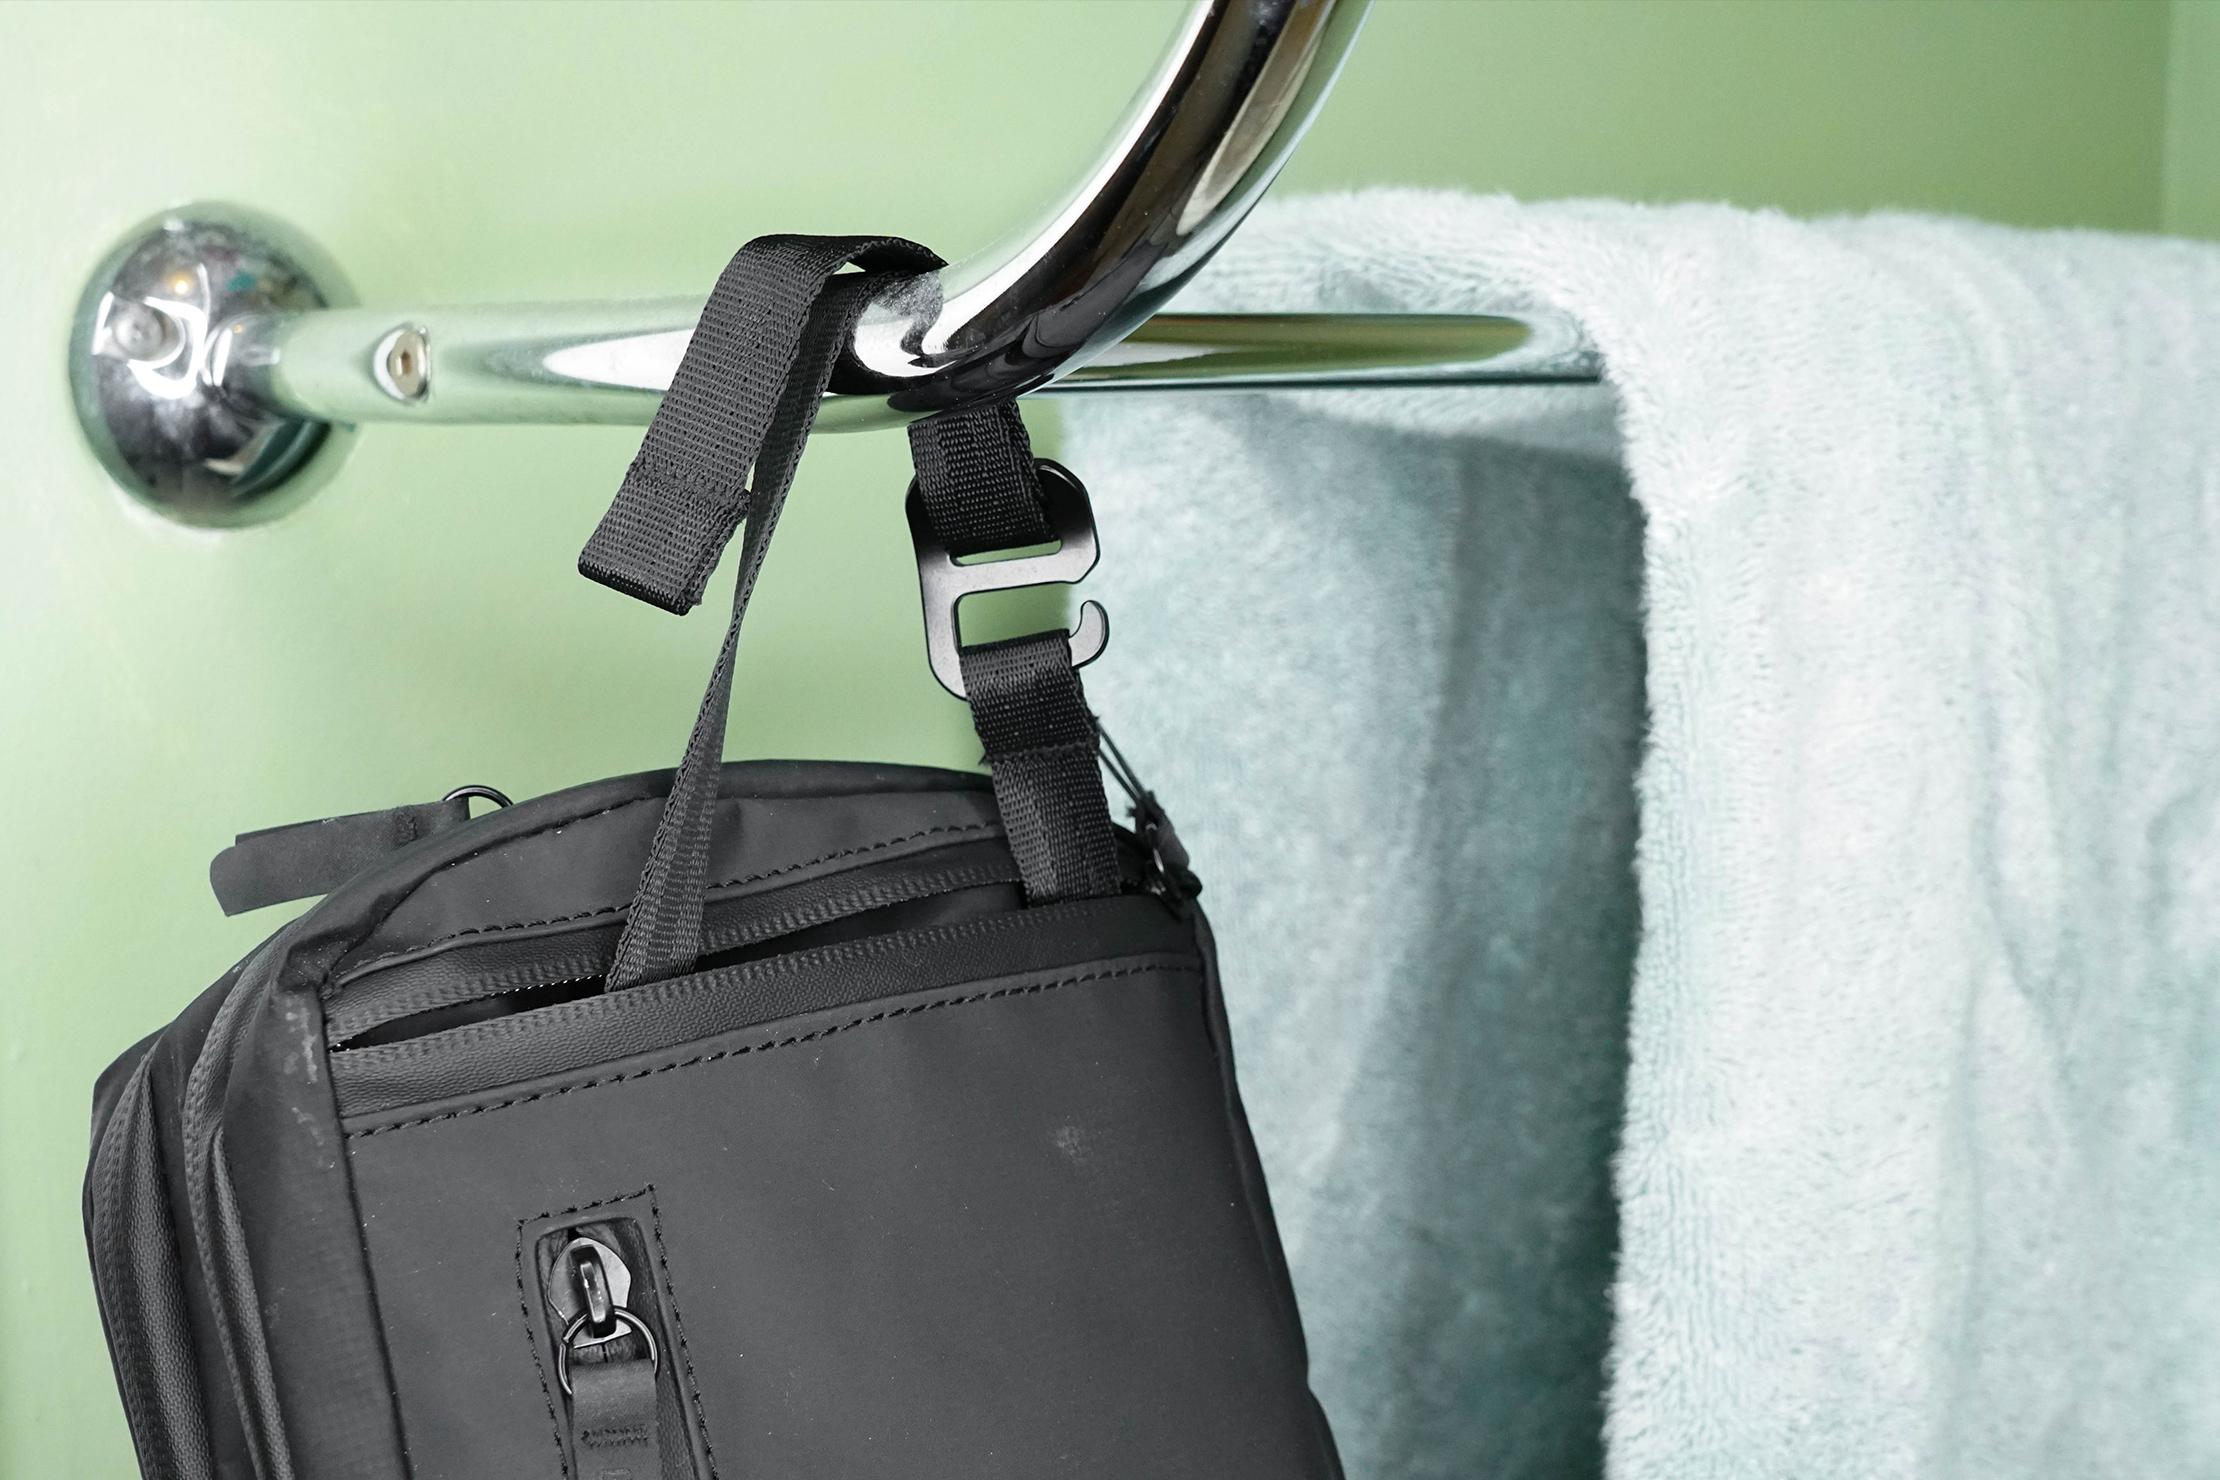 Gravel Explorer Plus Toiletry Bag Hanging